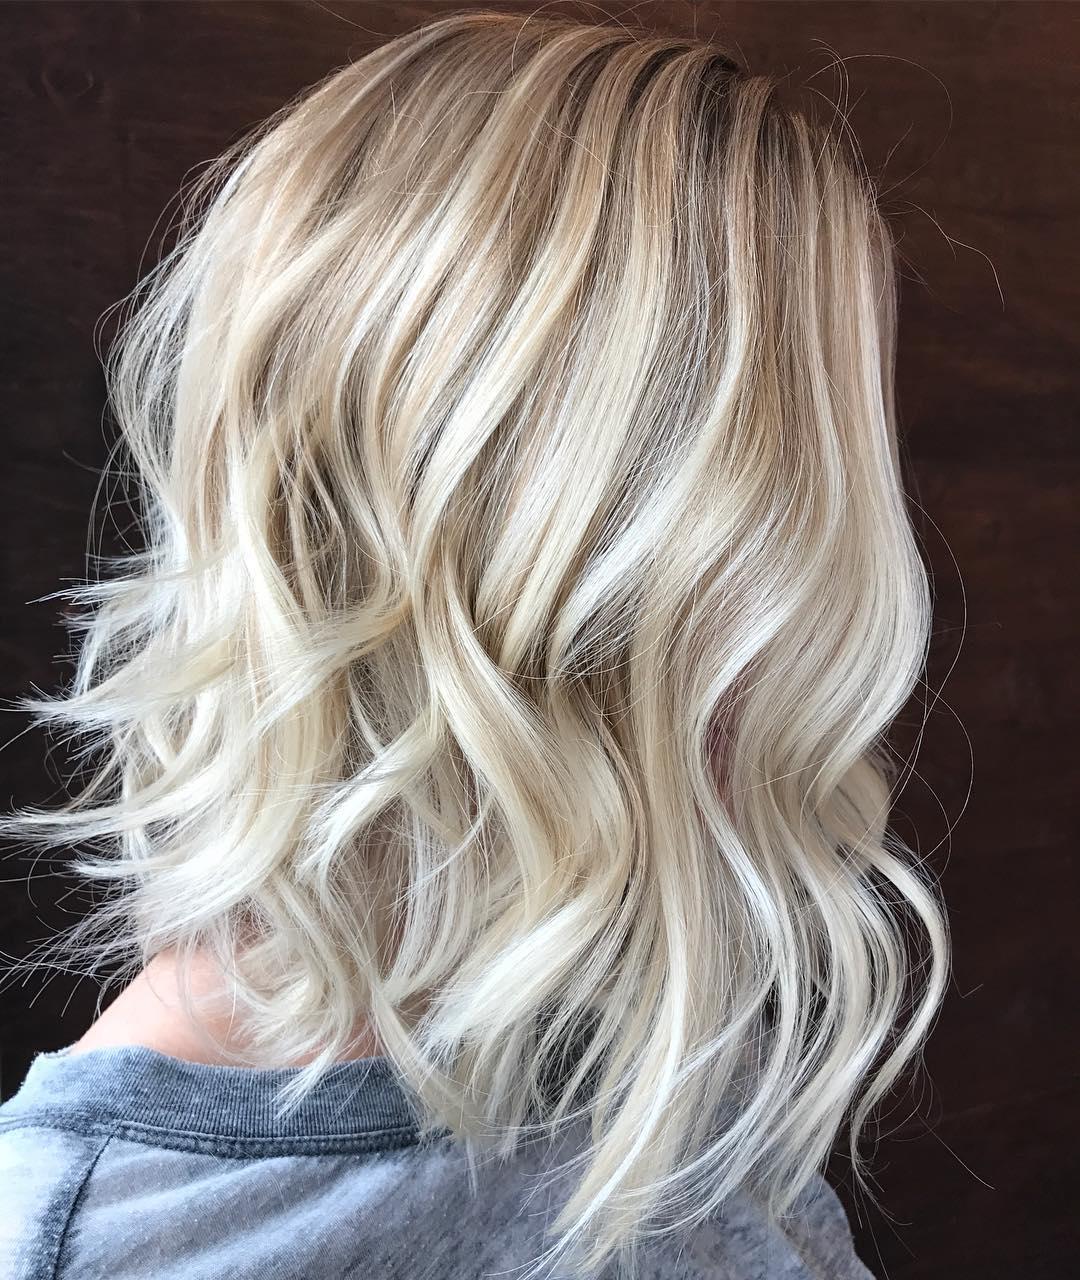 Shaggy Wavy Blonde Balayage Lob